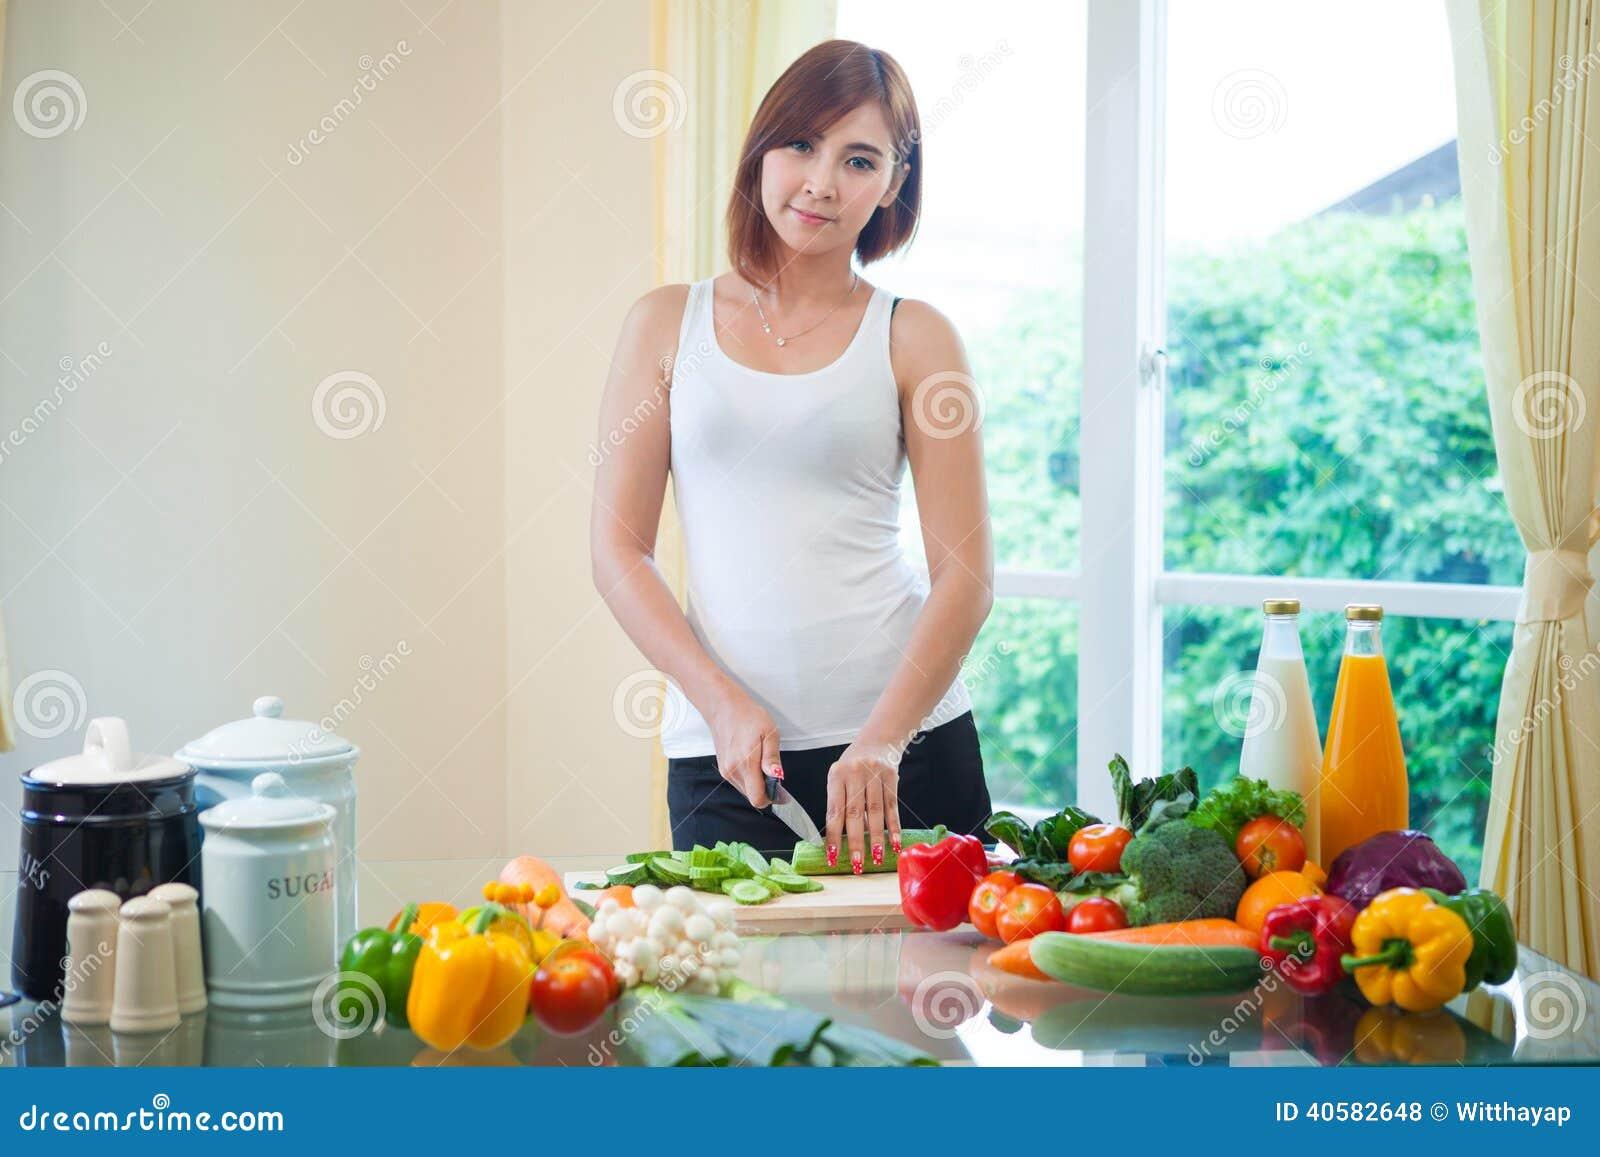 Asian girl kitchen